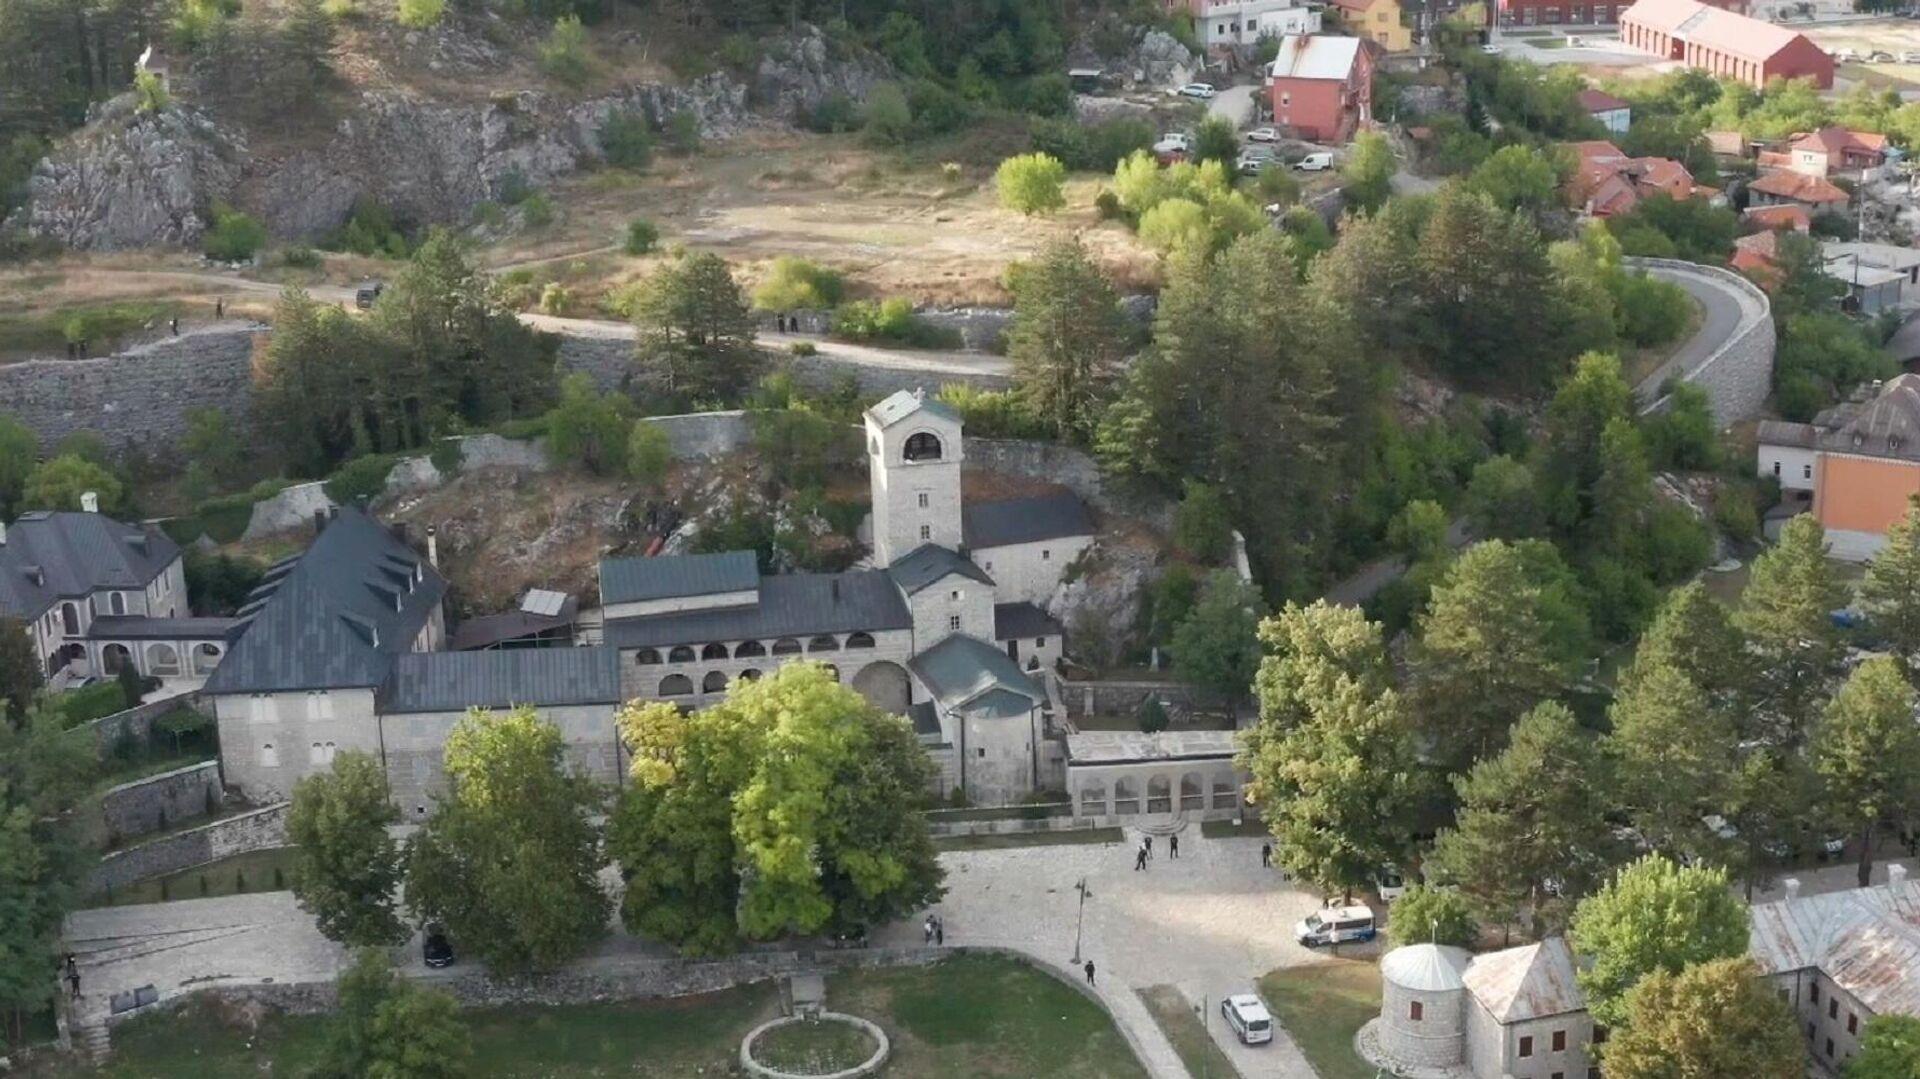 Цетињски манастир - Sputnik Србија, 1920, 16.09.2021